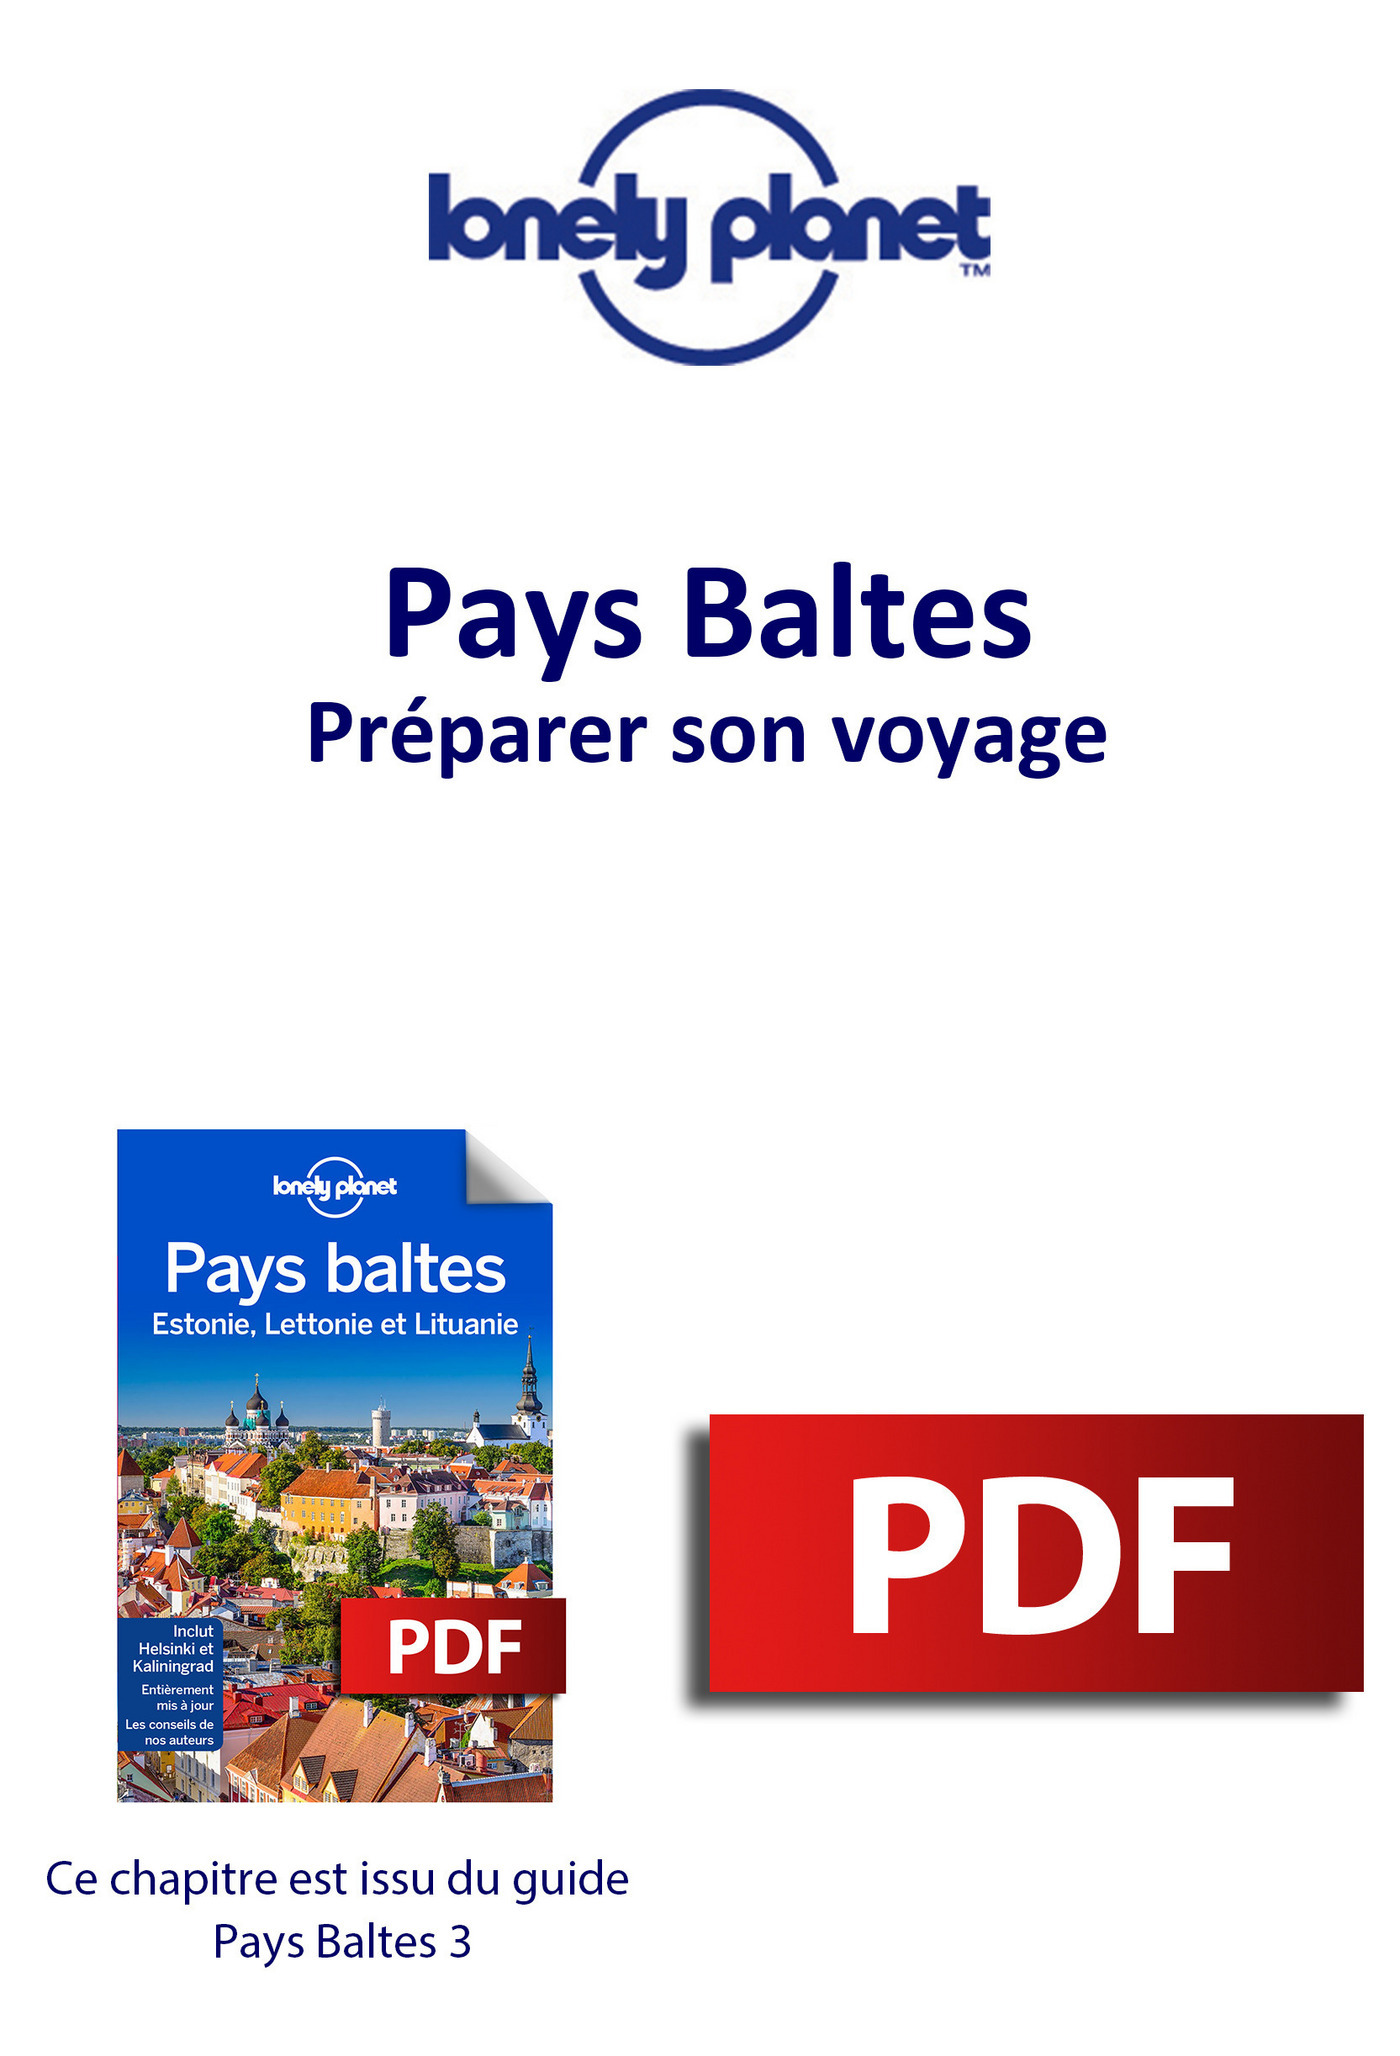 Pays Baltes - Préparer son voyage